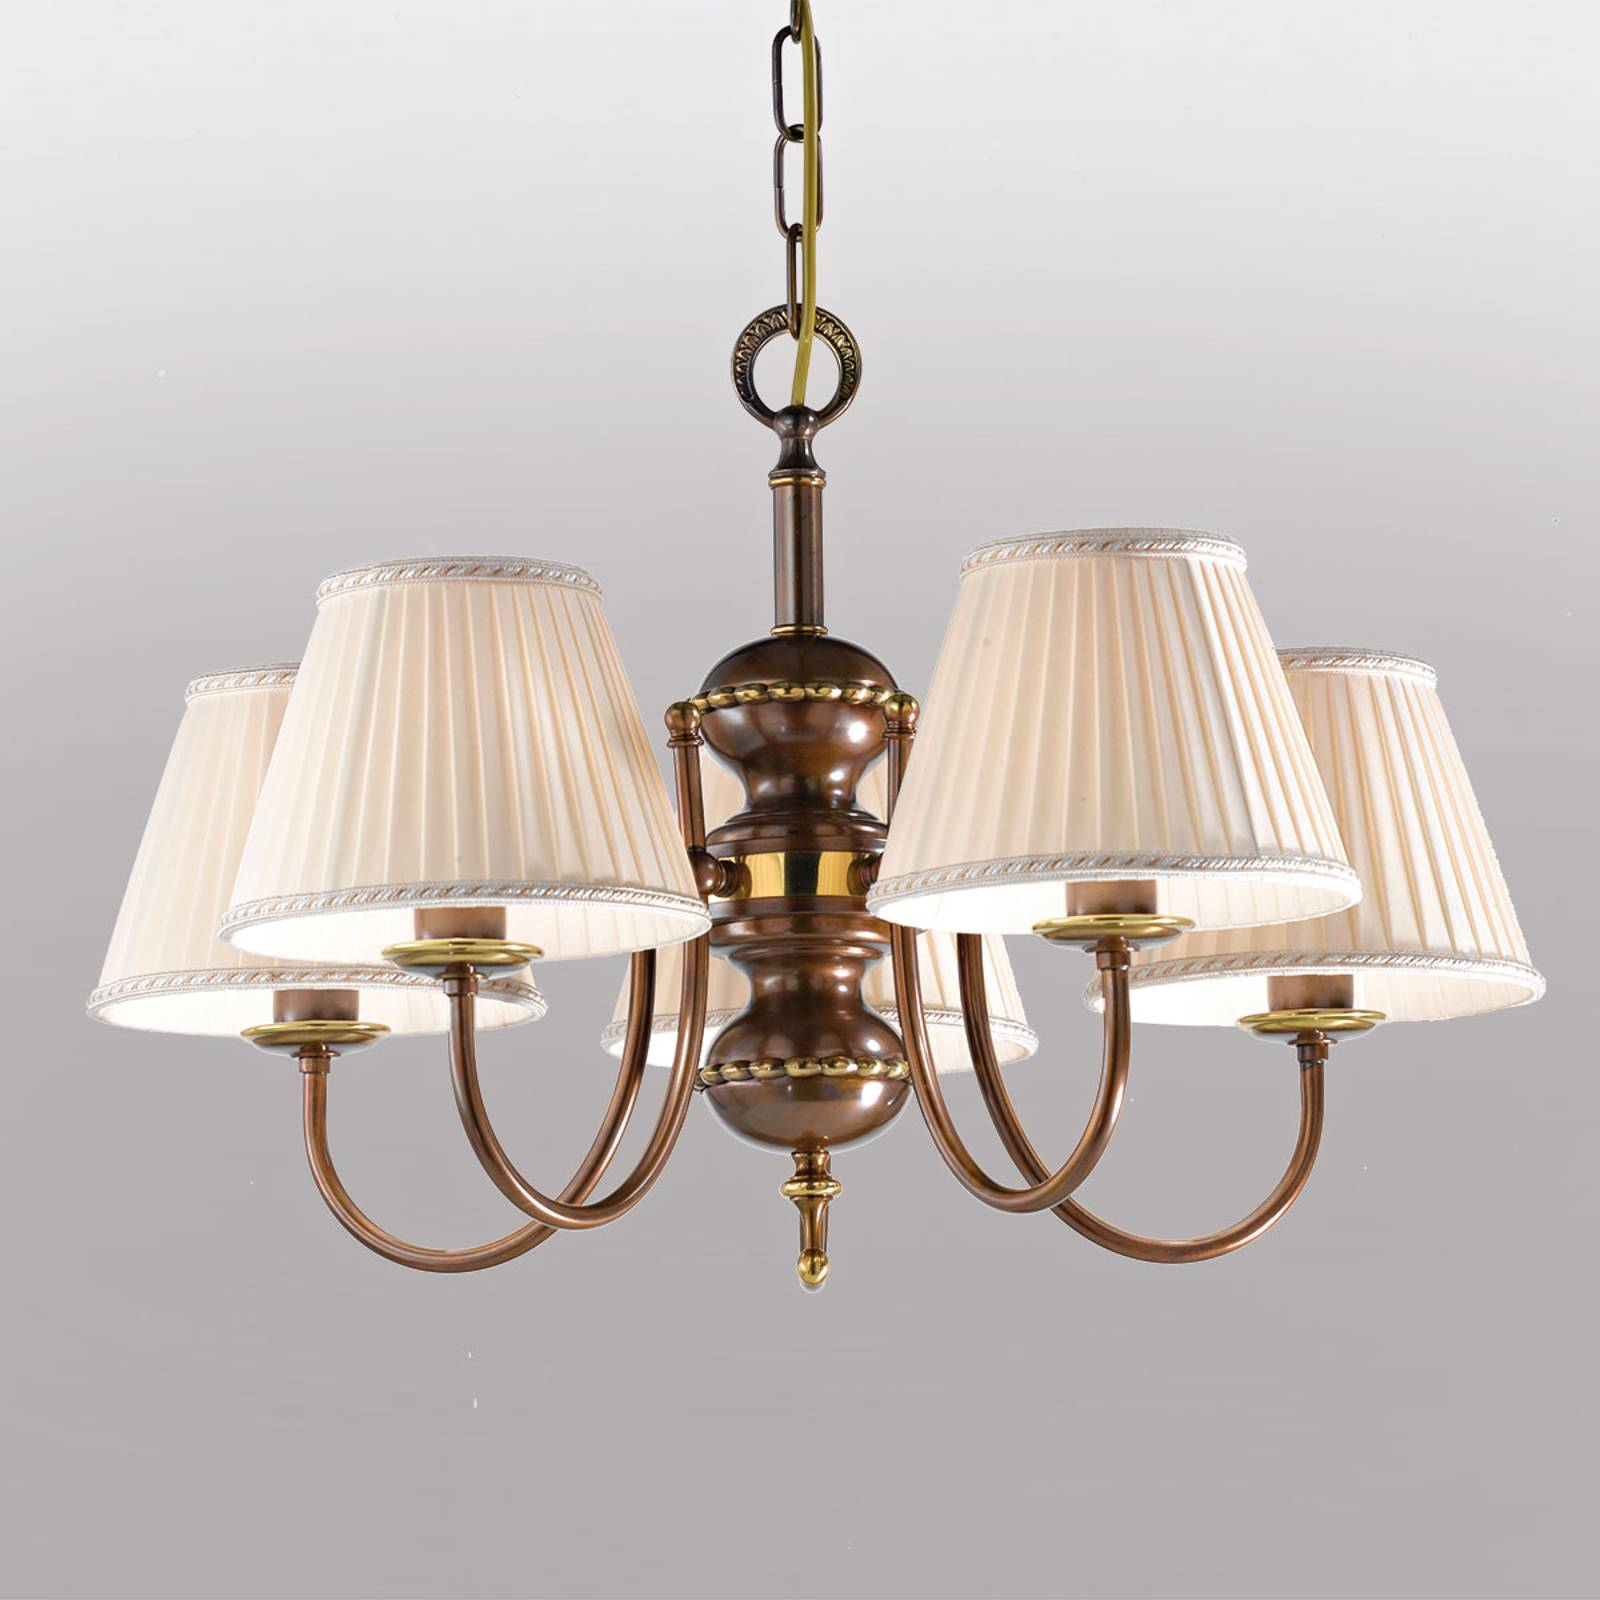 Suspension Classic à 5 lampes